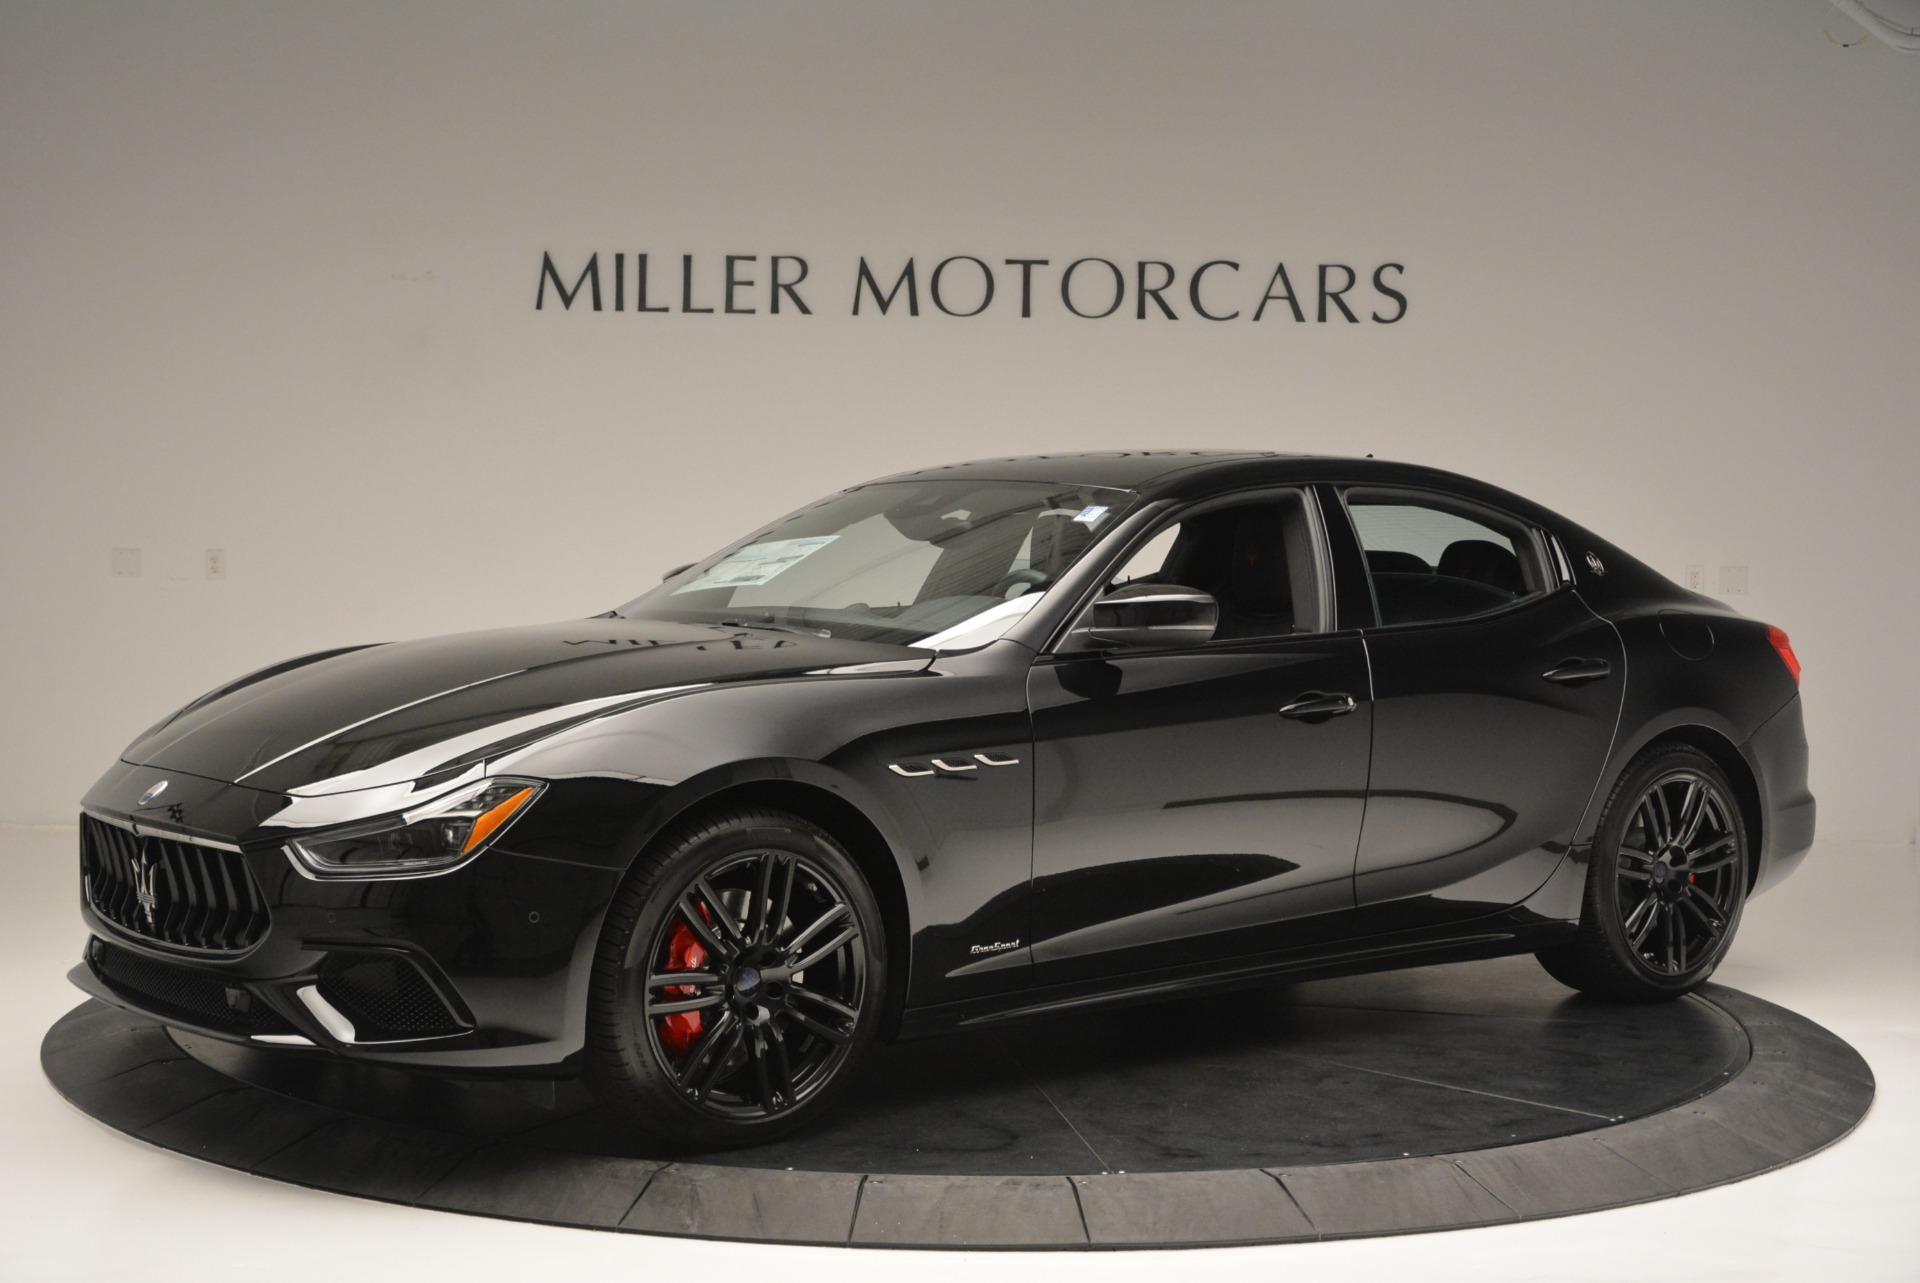 New 2018 Maserati Ghibli SQ4 GranSport Nerissimo For Sale In Westport, CT 2368_p2